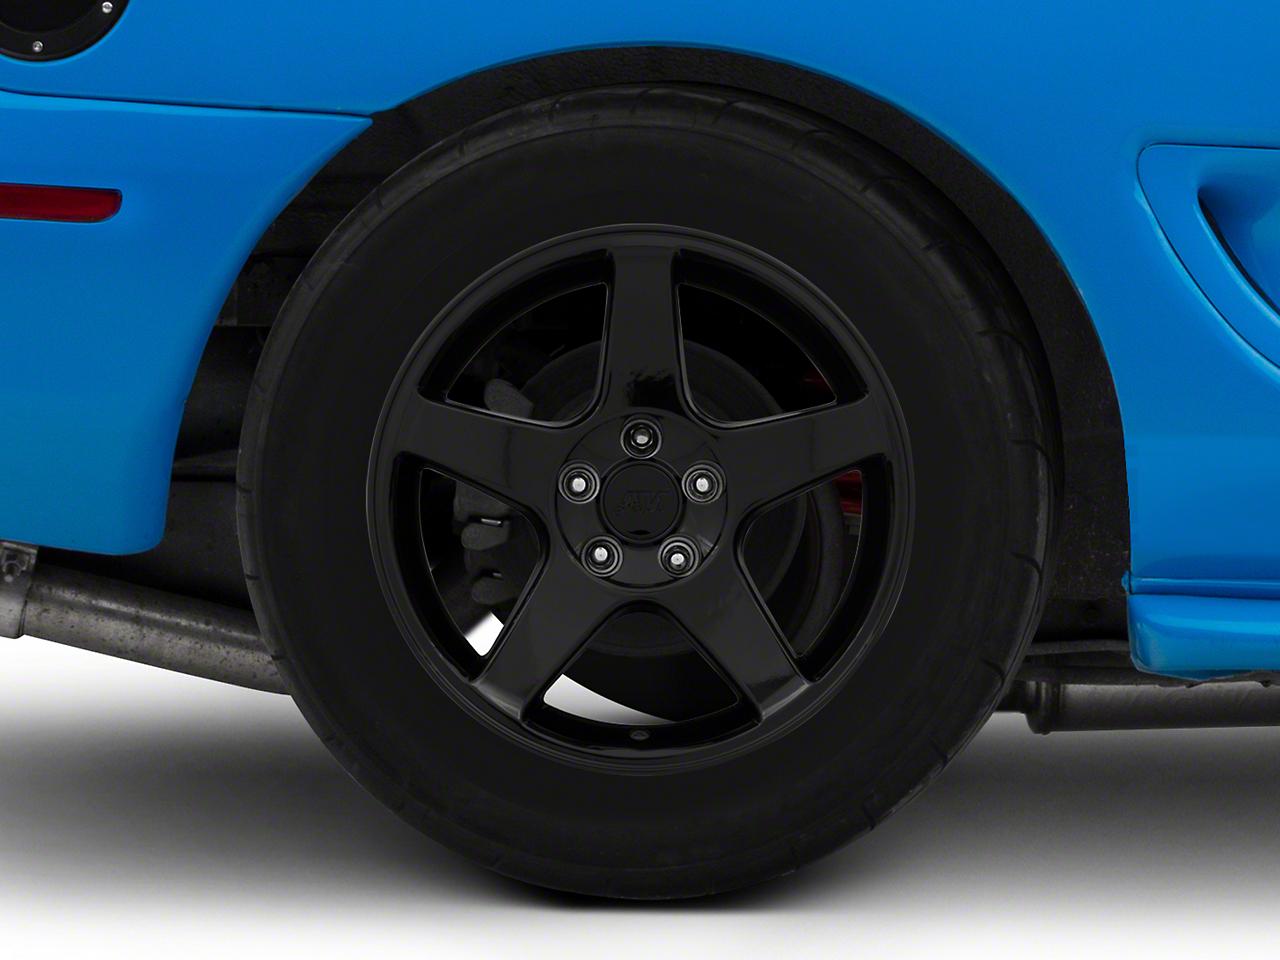 2003 Cobra Style Black Wheel - 17x10.5 (94-04 All)